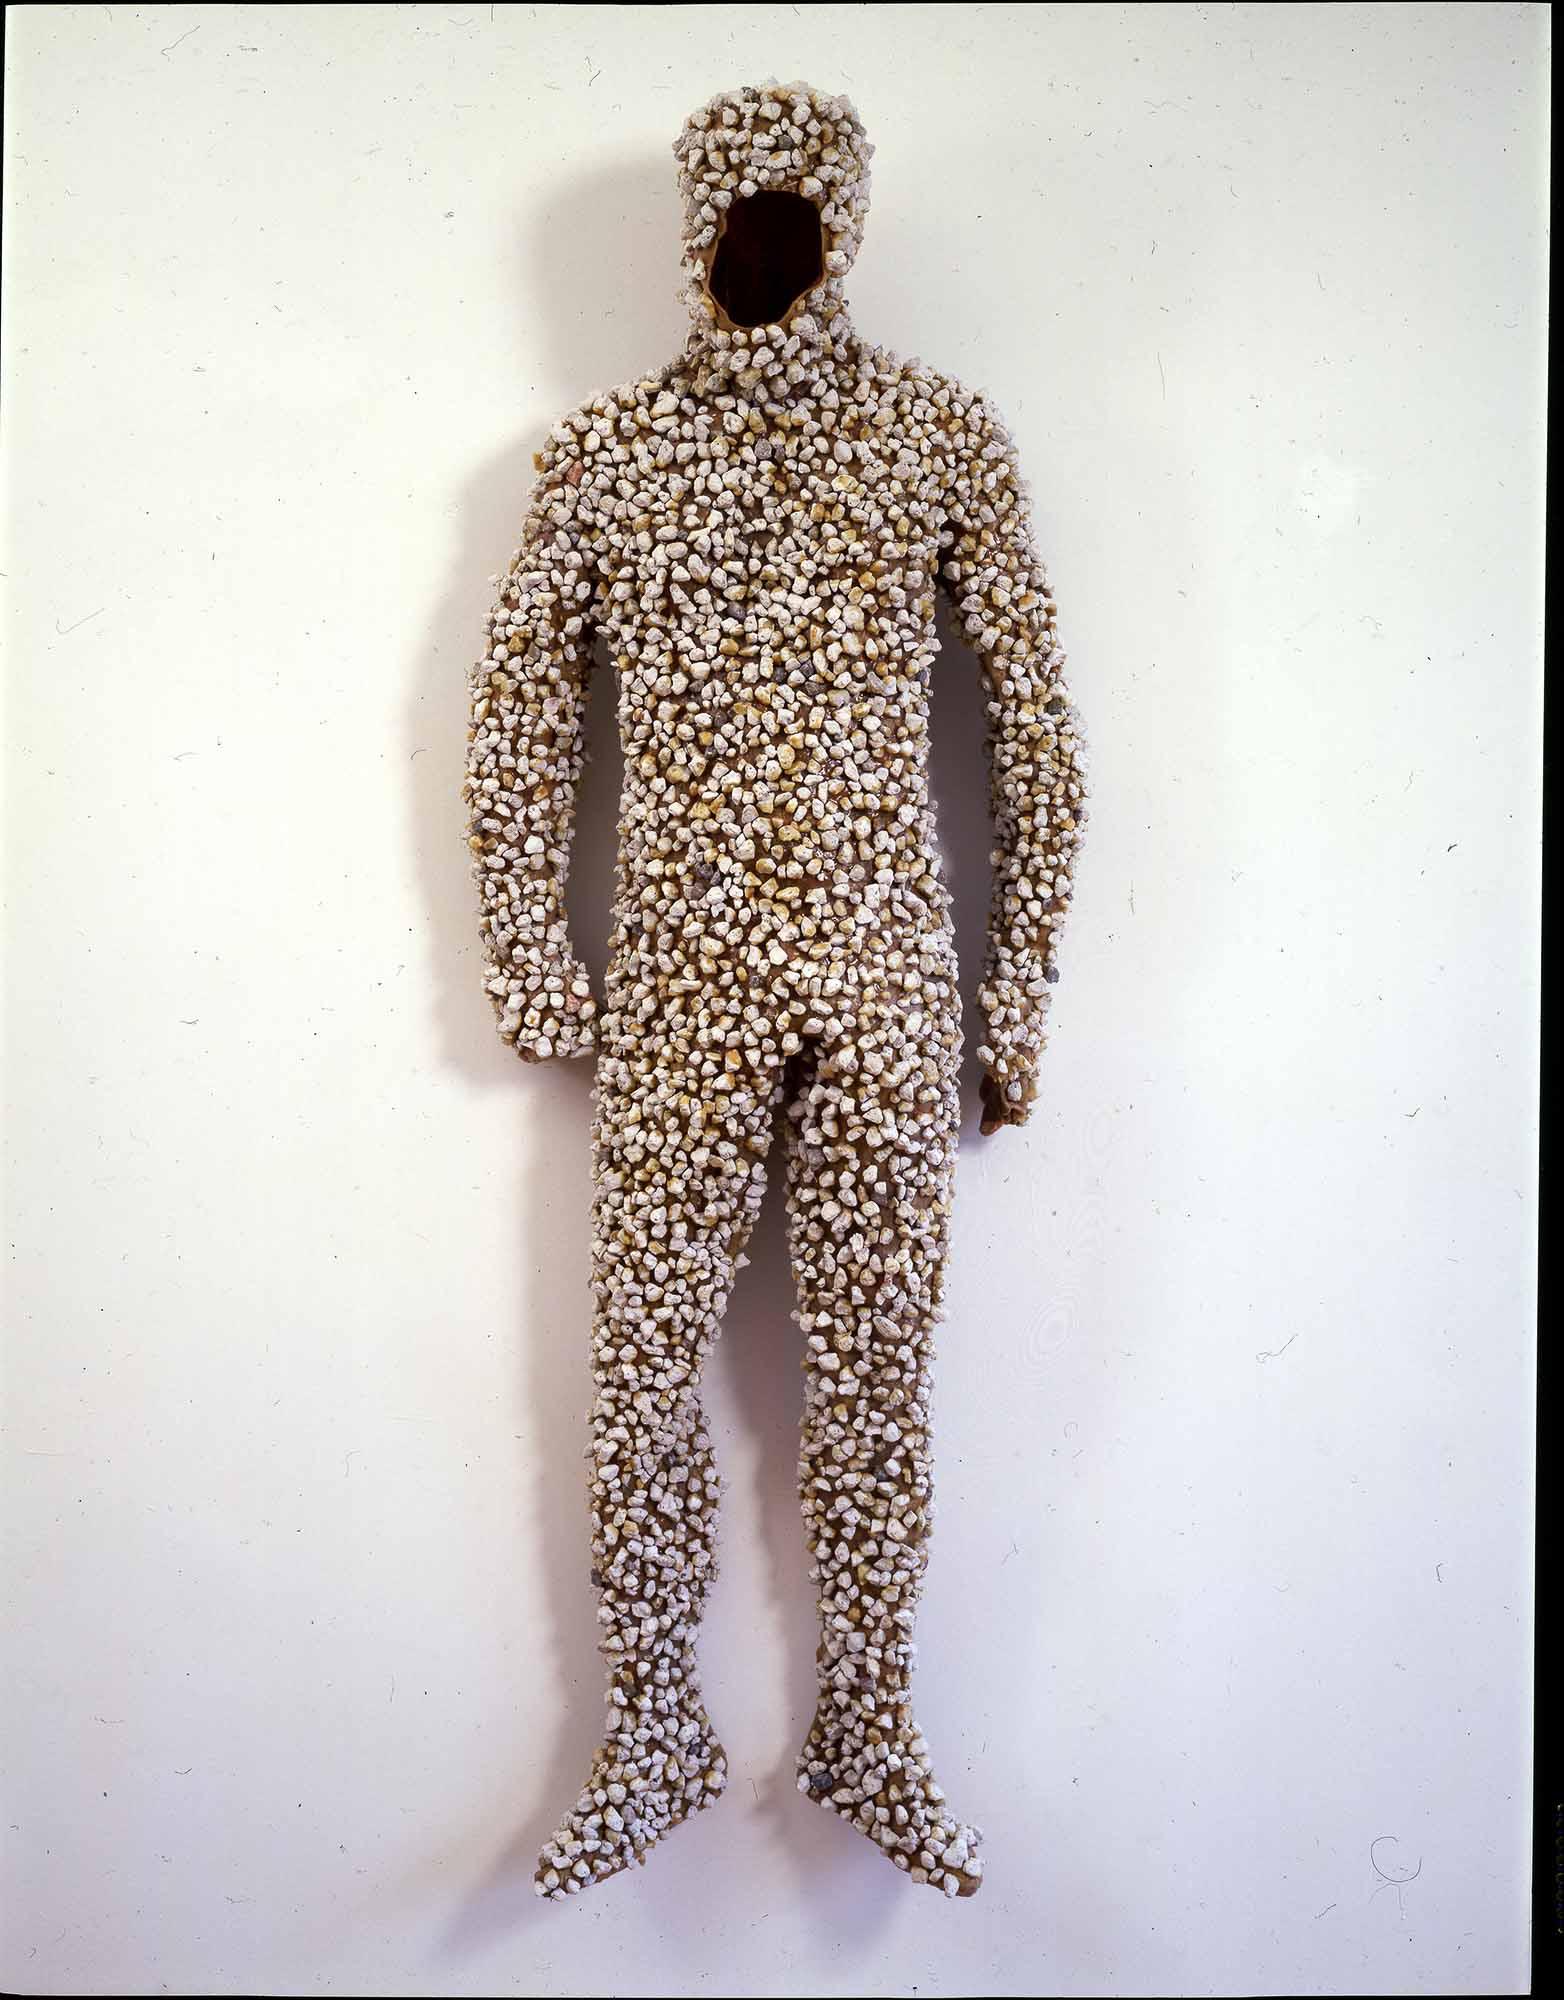 Interpersonal Relationship Suit, 1995.